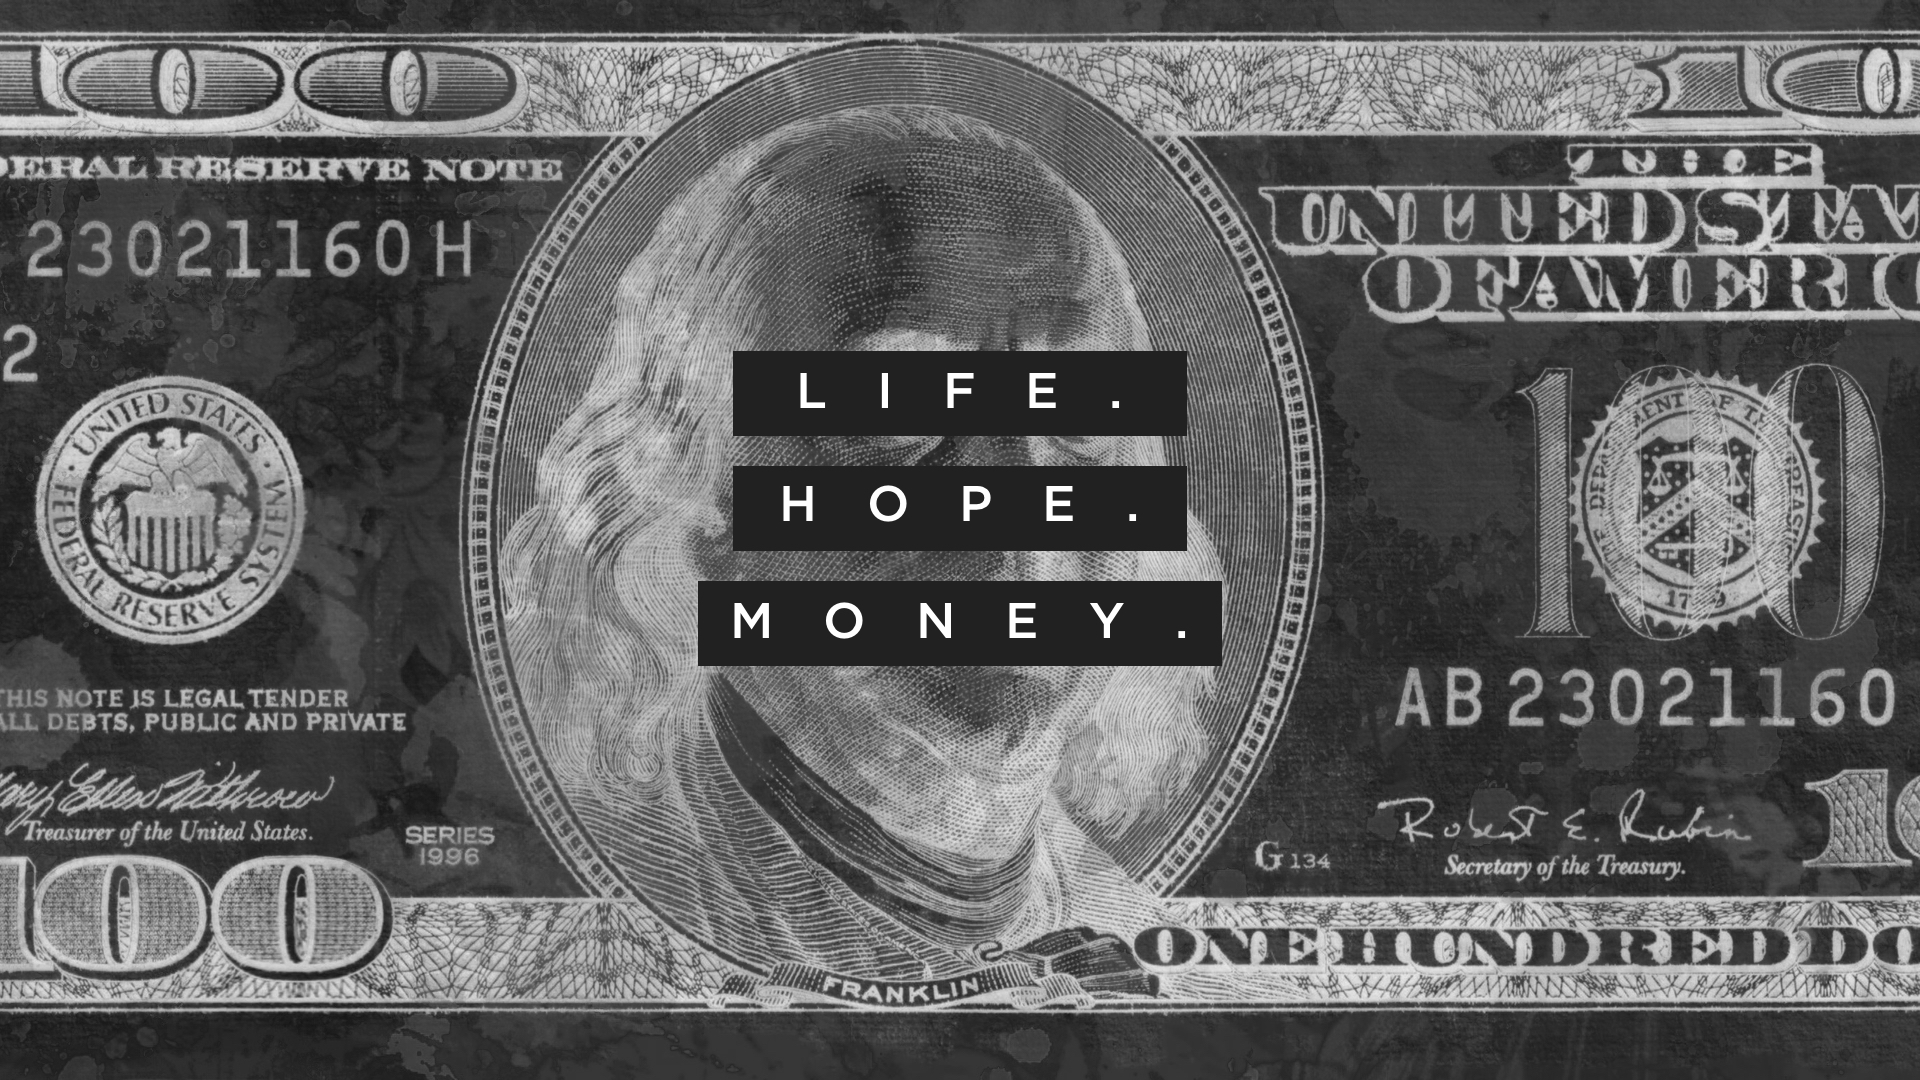 LIFE. HOPE. MONEY. Main.jpg